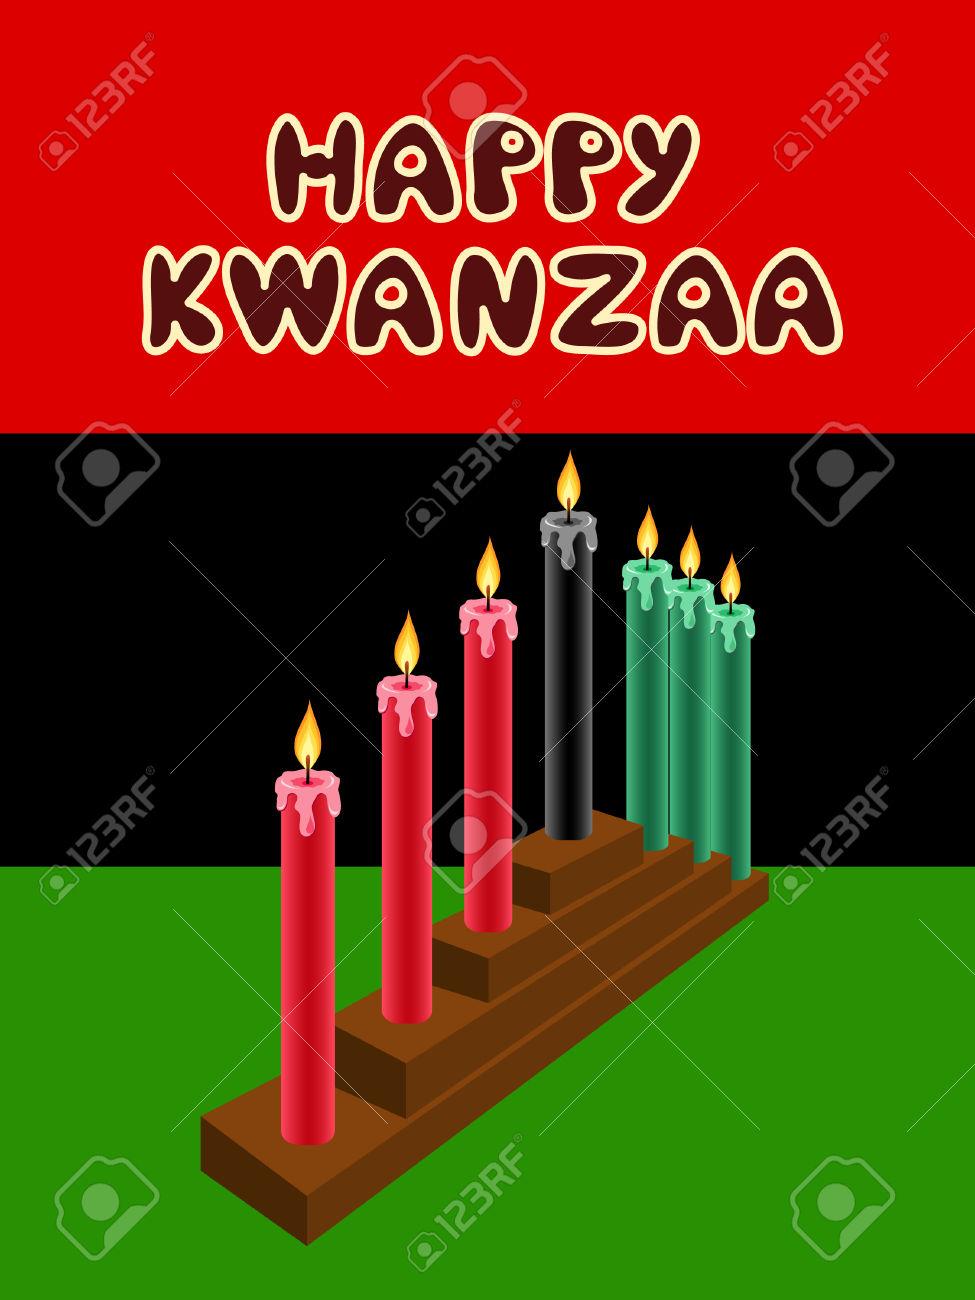 Kwanzaa Kinara With The Black Liberation Flag As Backdrop Royalty.